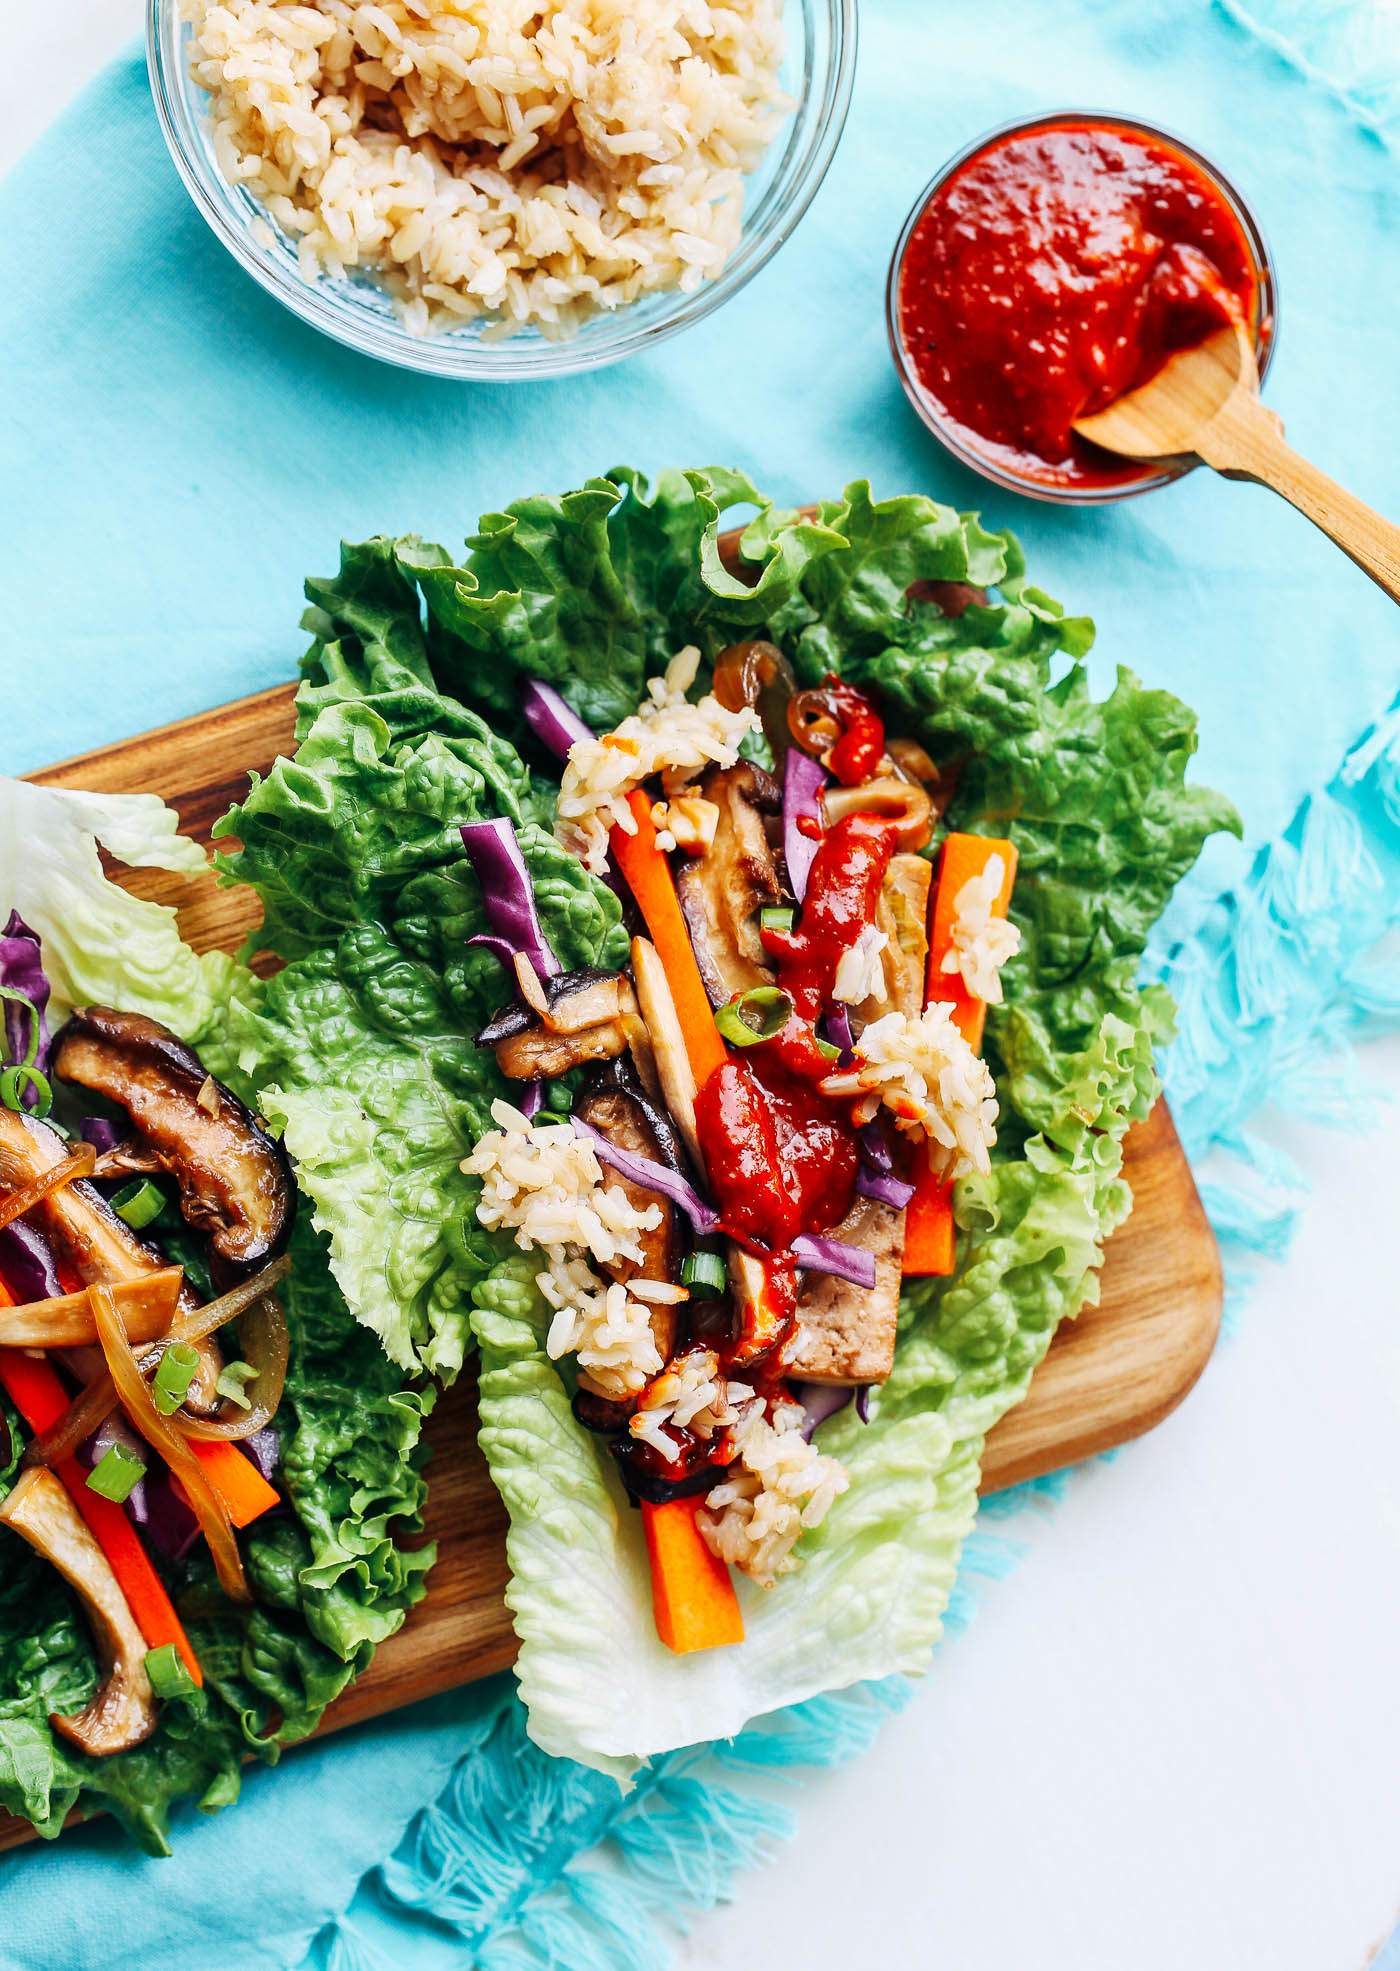 wraps vegan lettuce bulgogi vegetarian korean healthy bbq recipe recipes beef meal cooking tofu plan health version meat traditional veggie